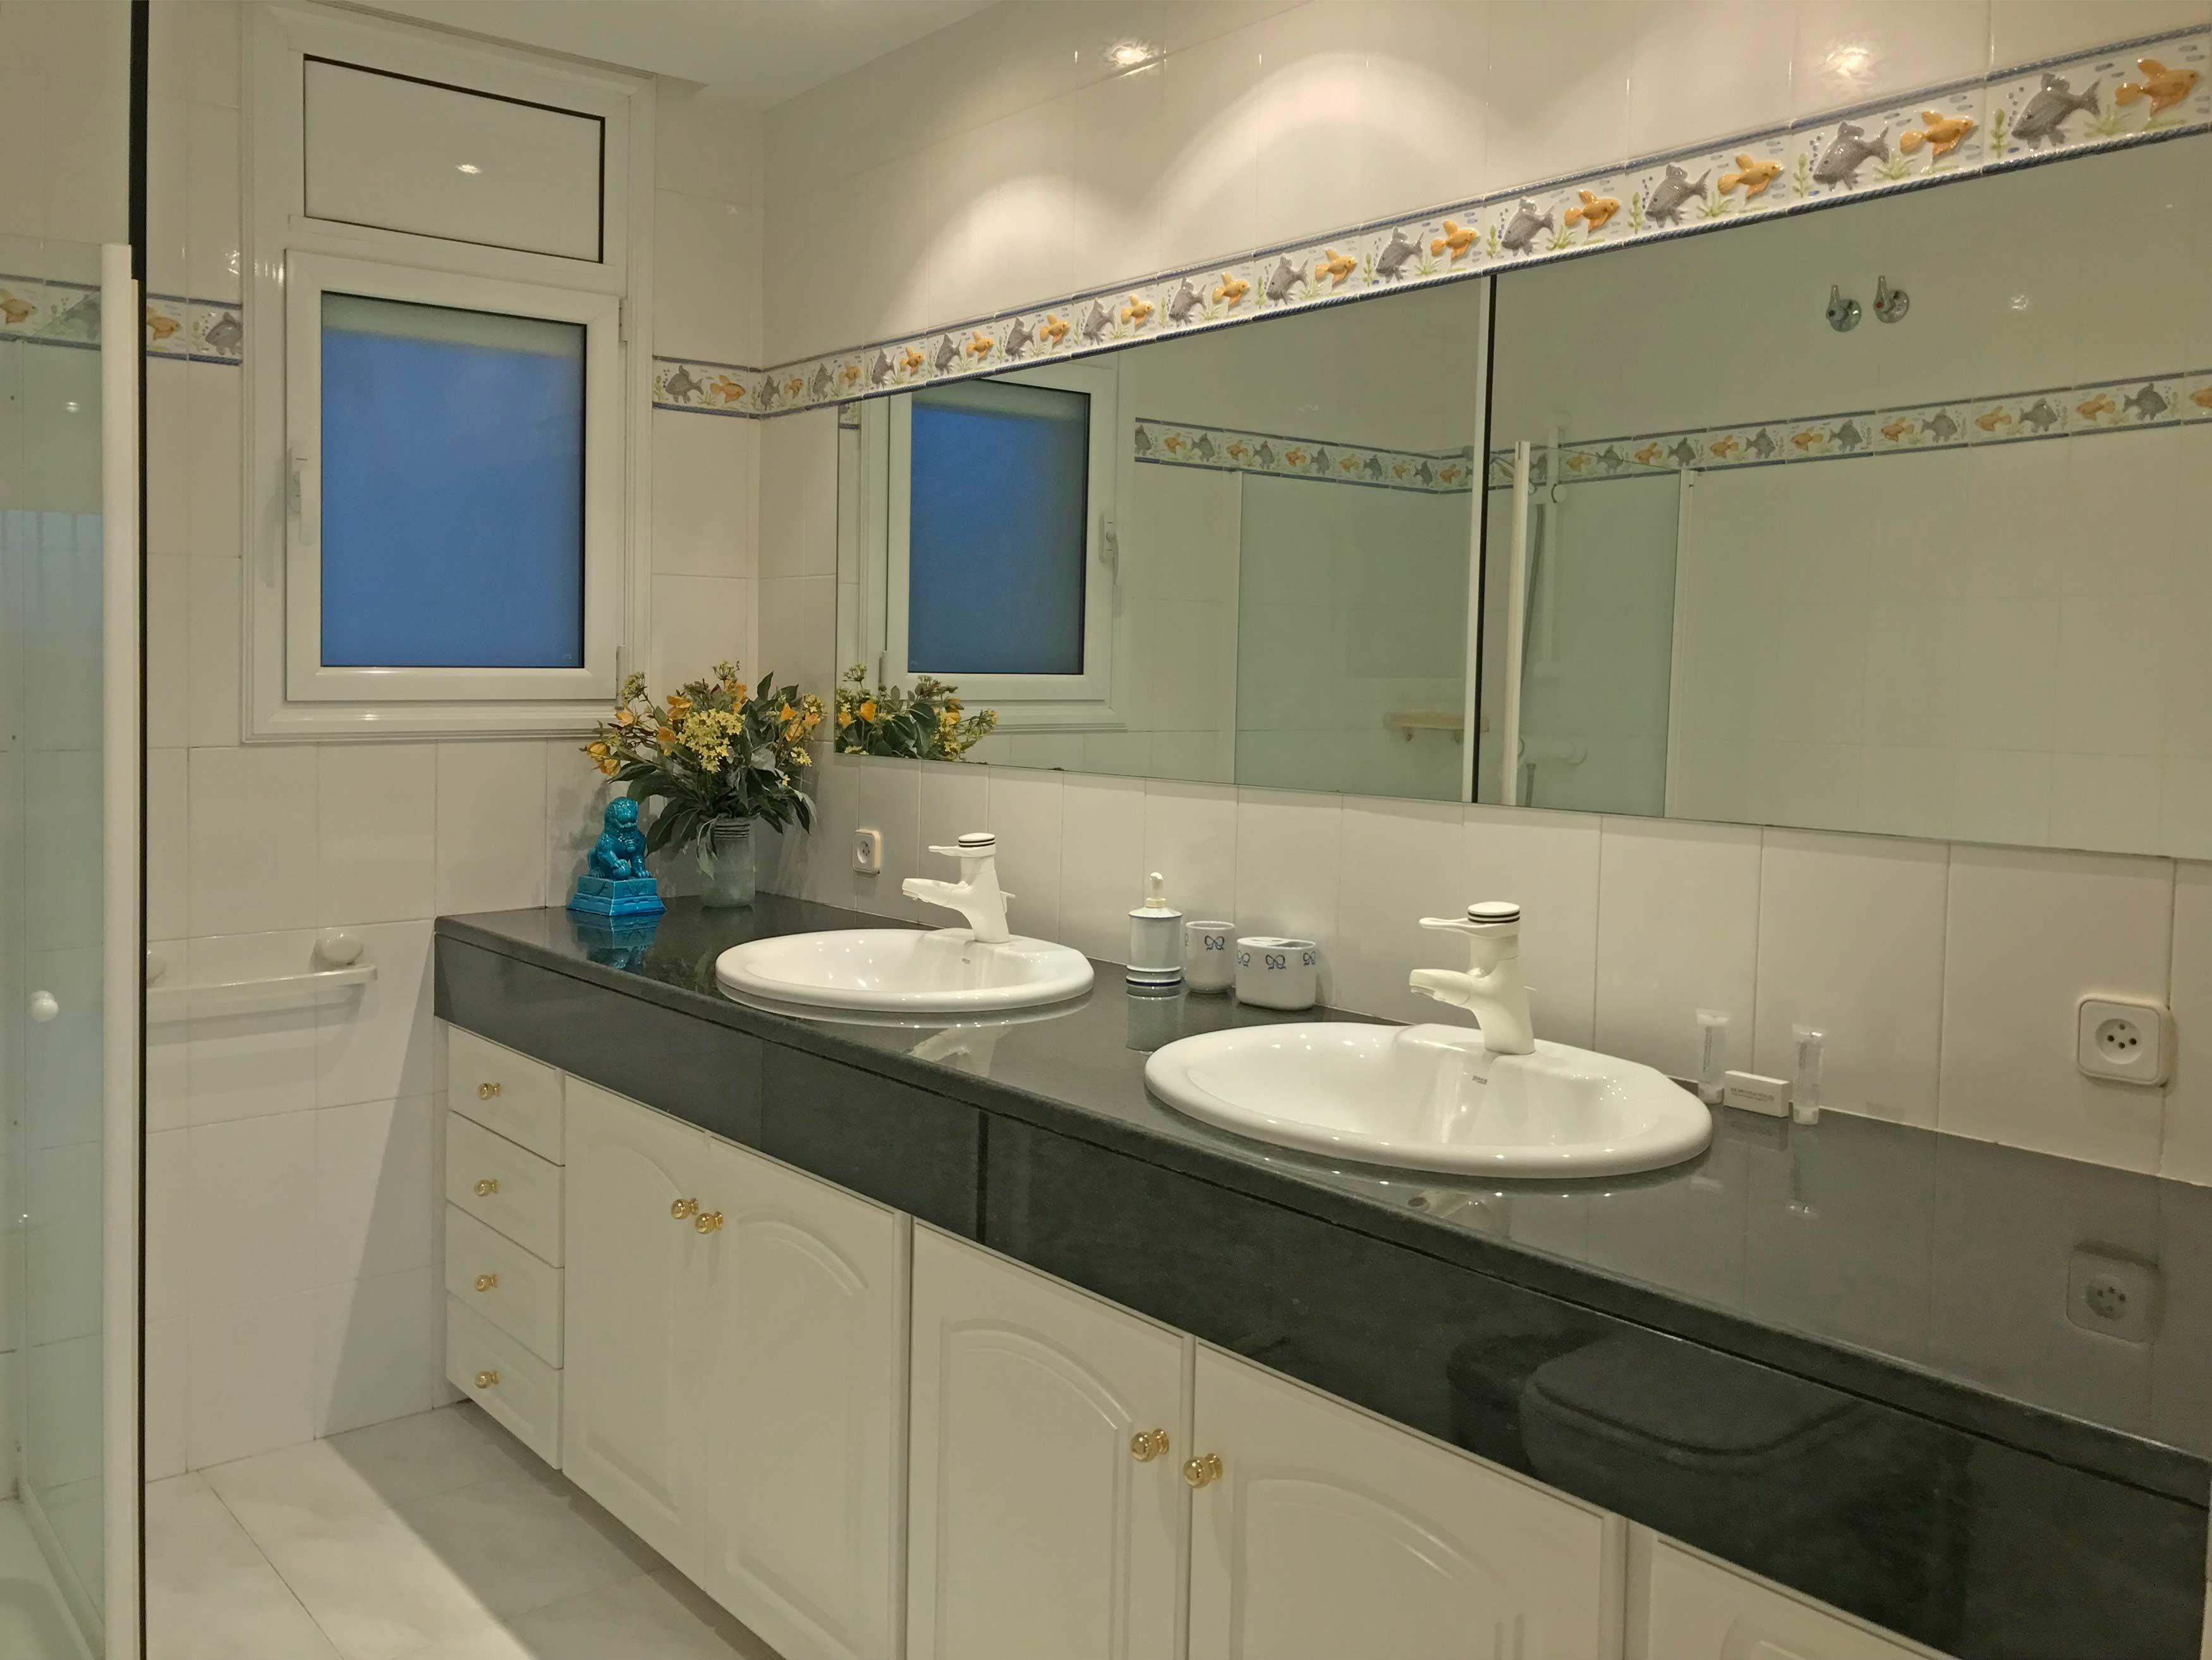 De badkamer op de bovenste etage van villa Cap de la Barra